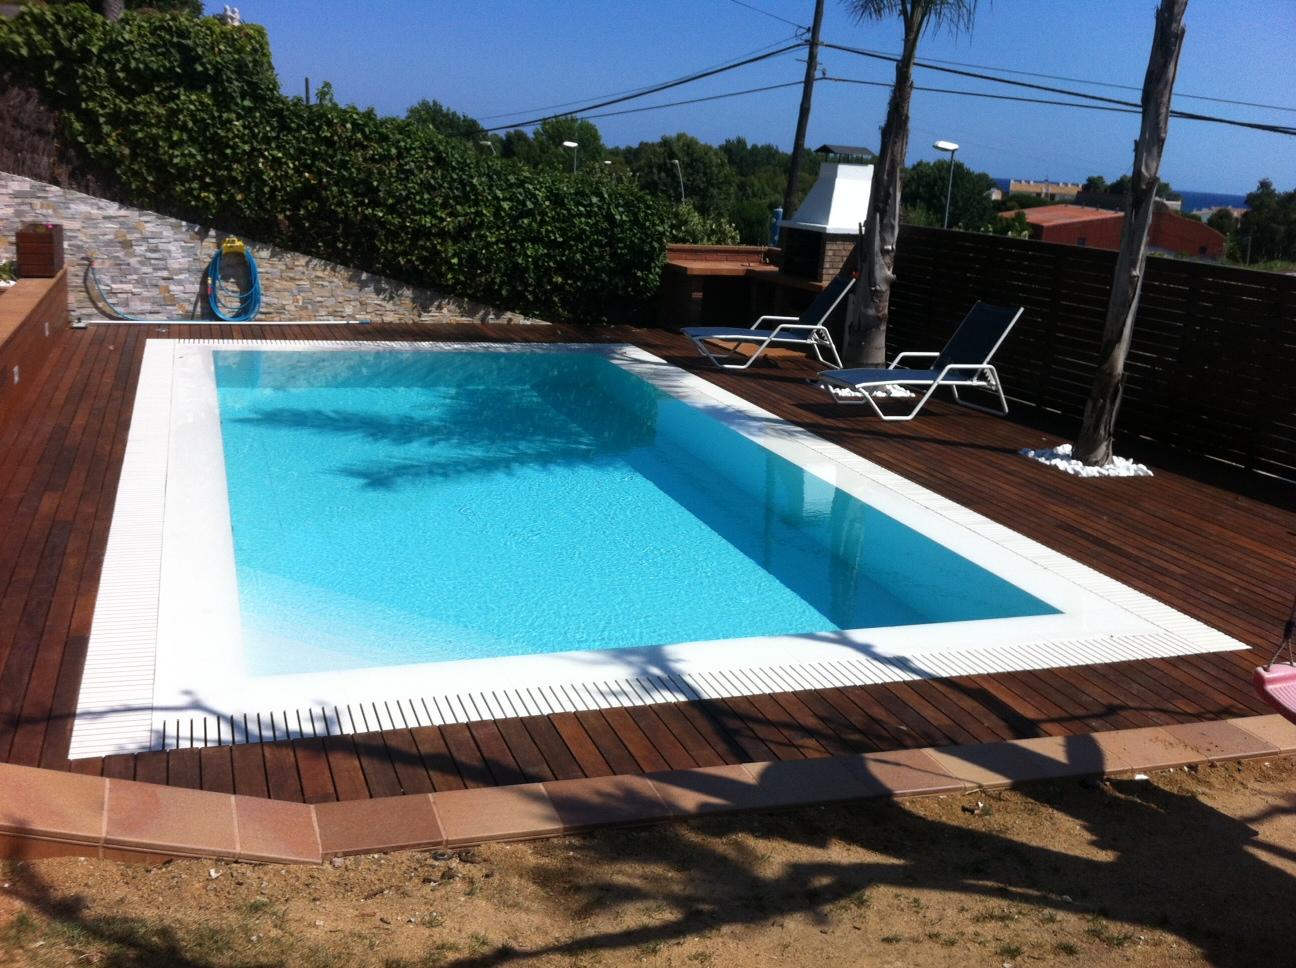 rosa gres piscina blanca agua azul caribe